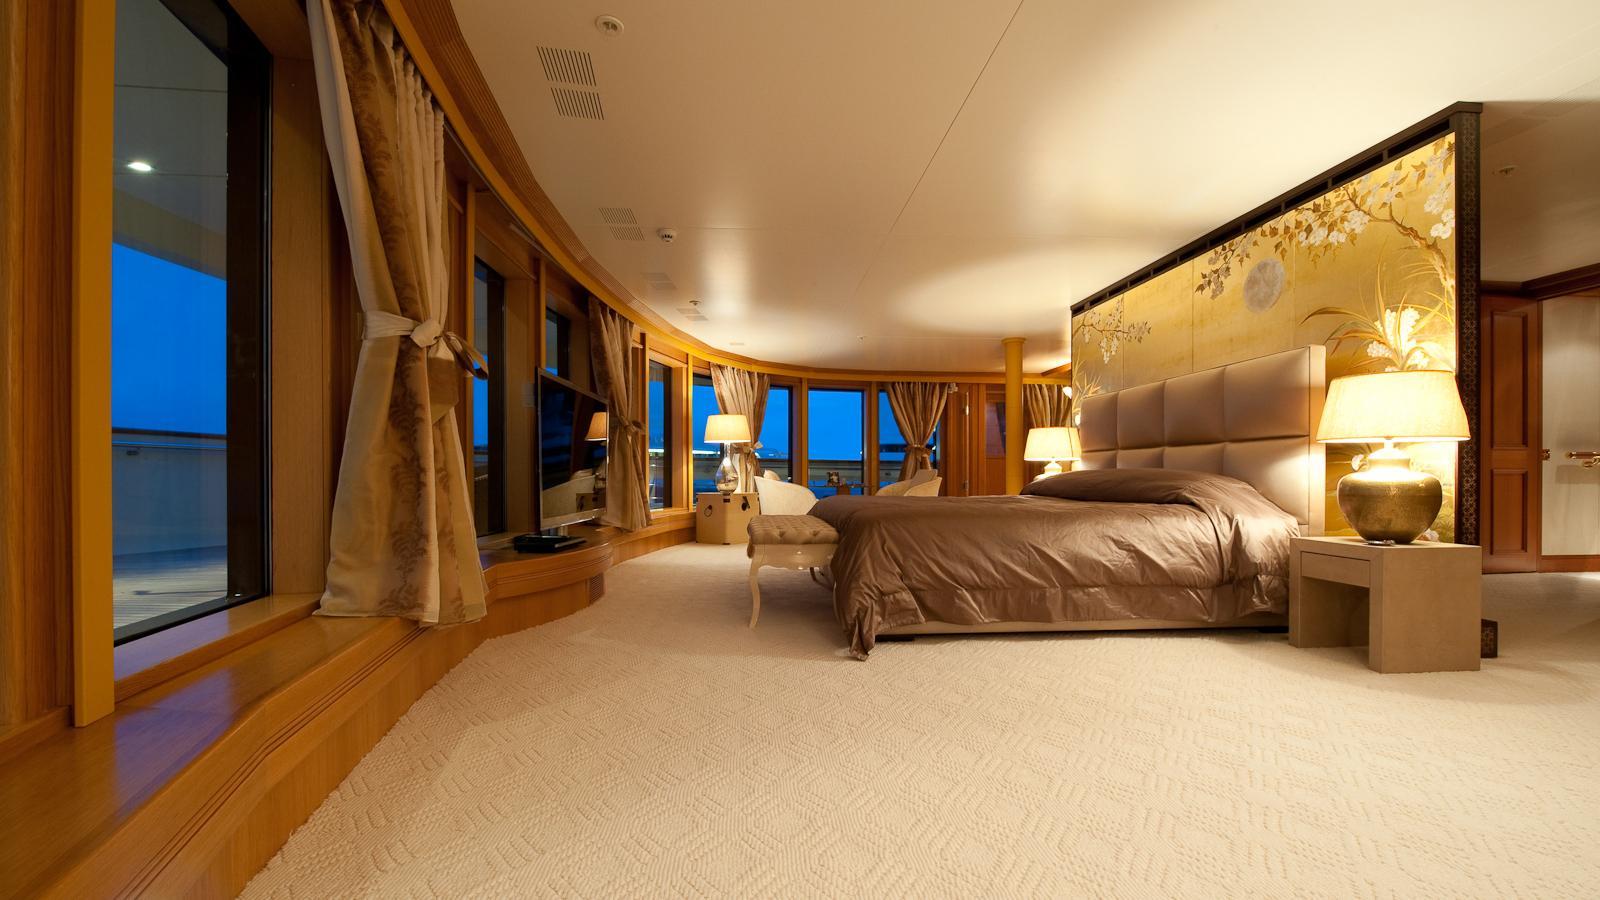 reborn-motor-yacht-amels-1999-75m-stateroom